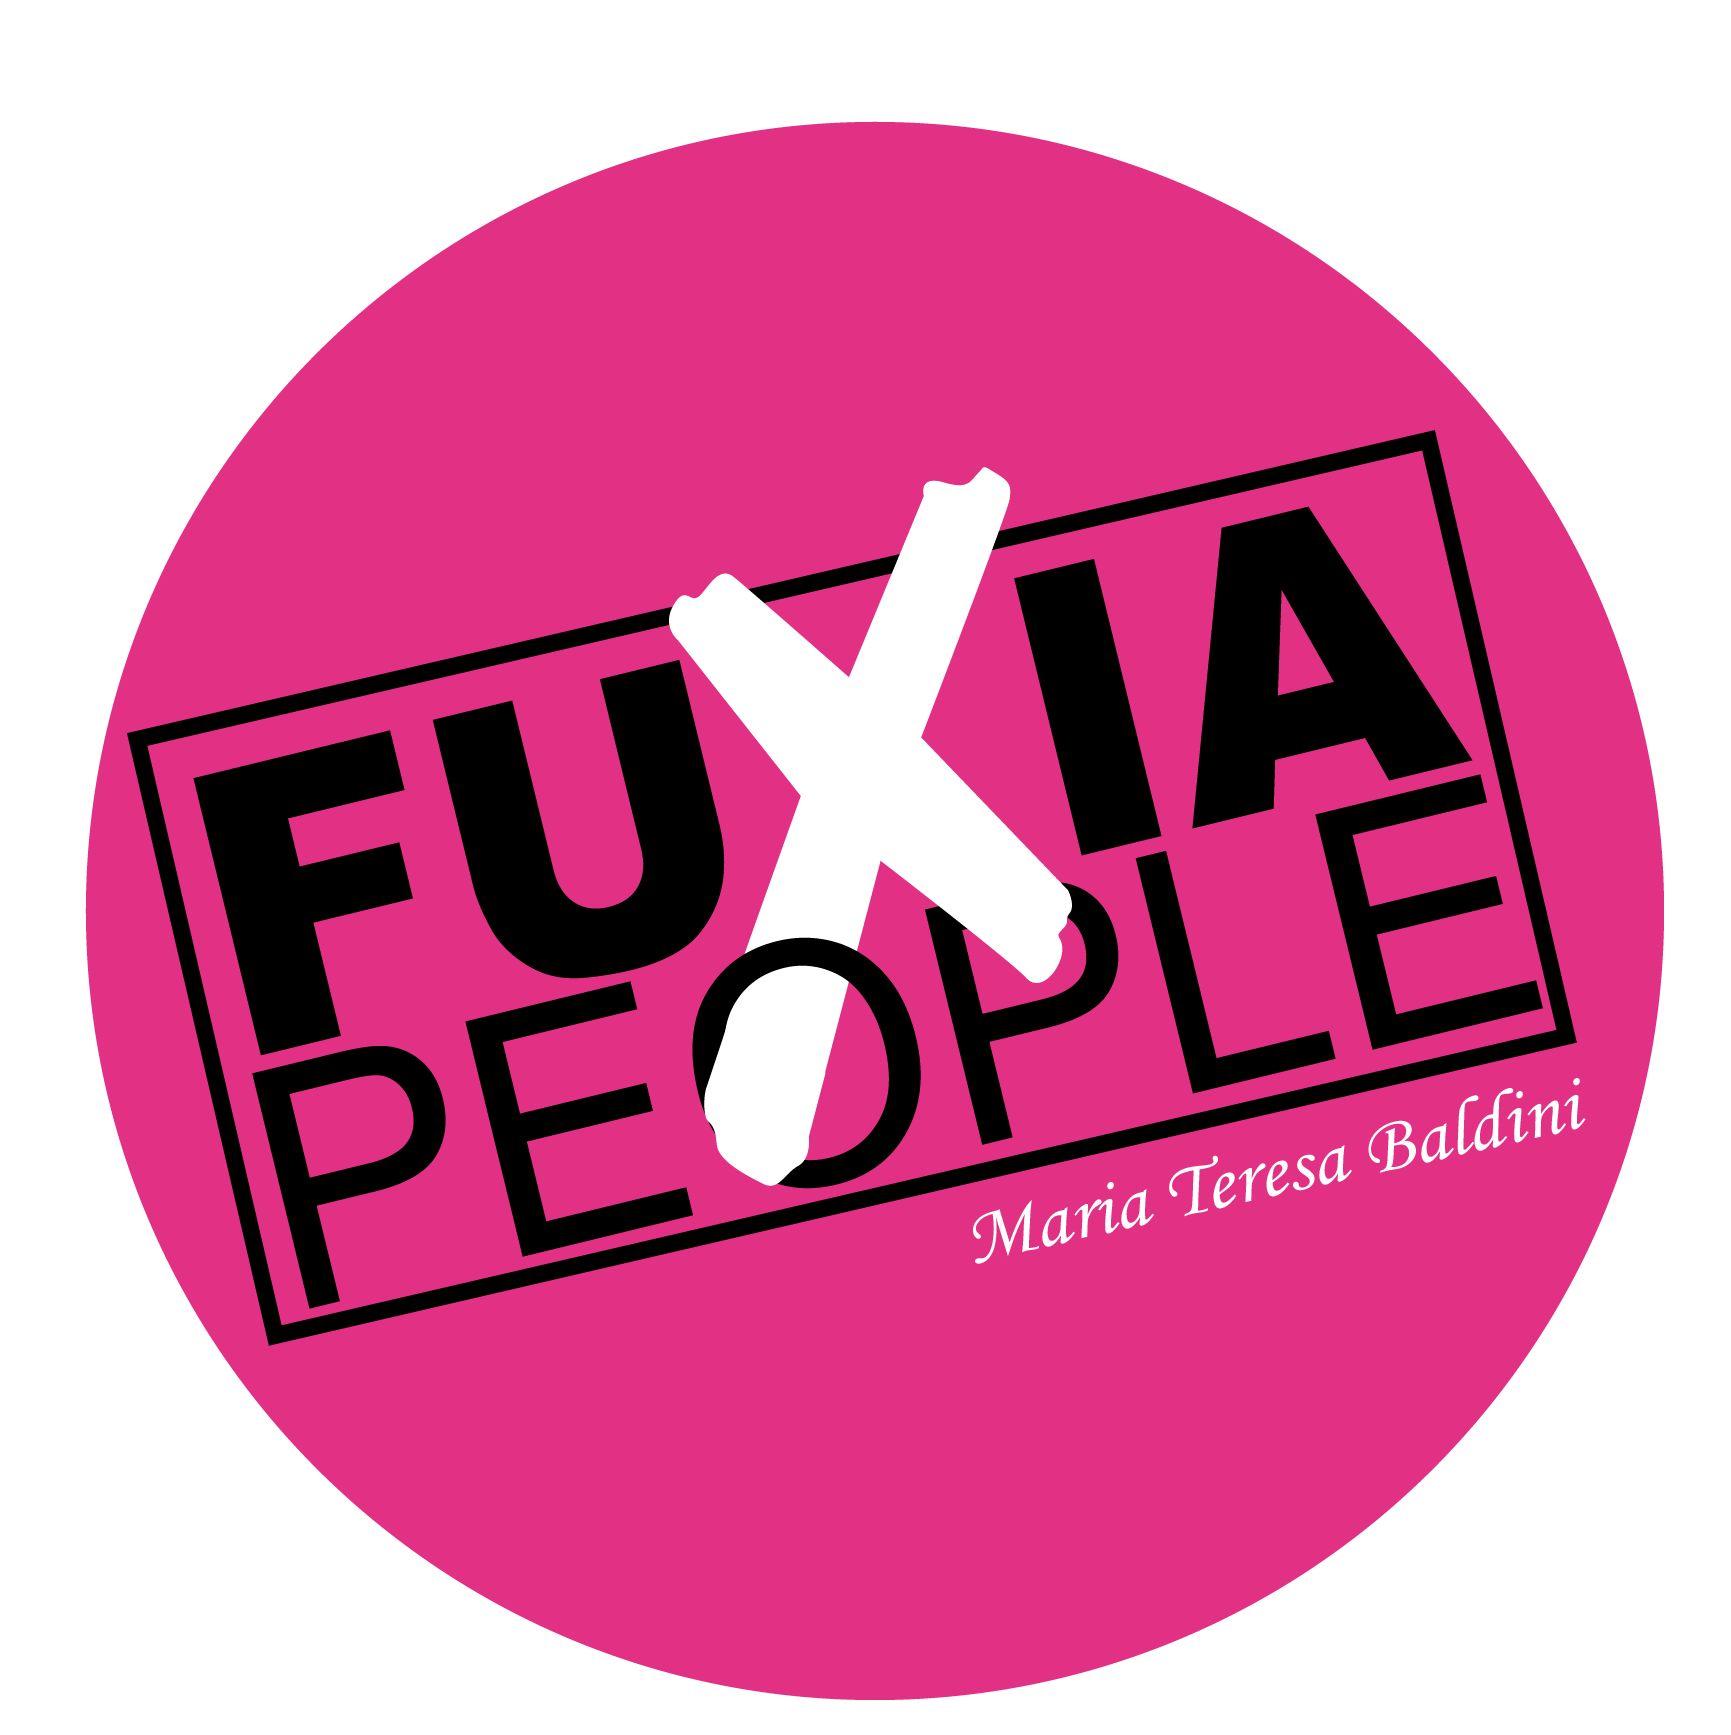 Presentata lista Fuxia People Maria Teresa Baldini Sindaco